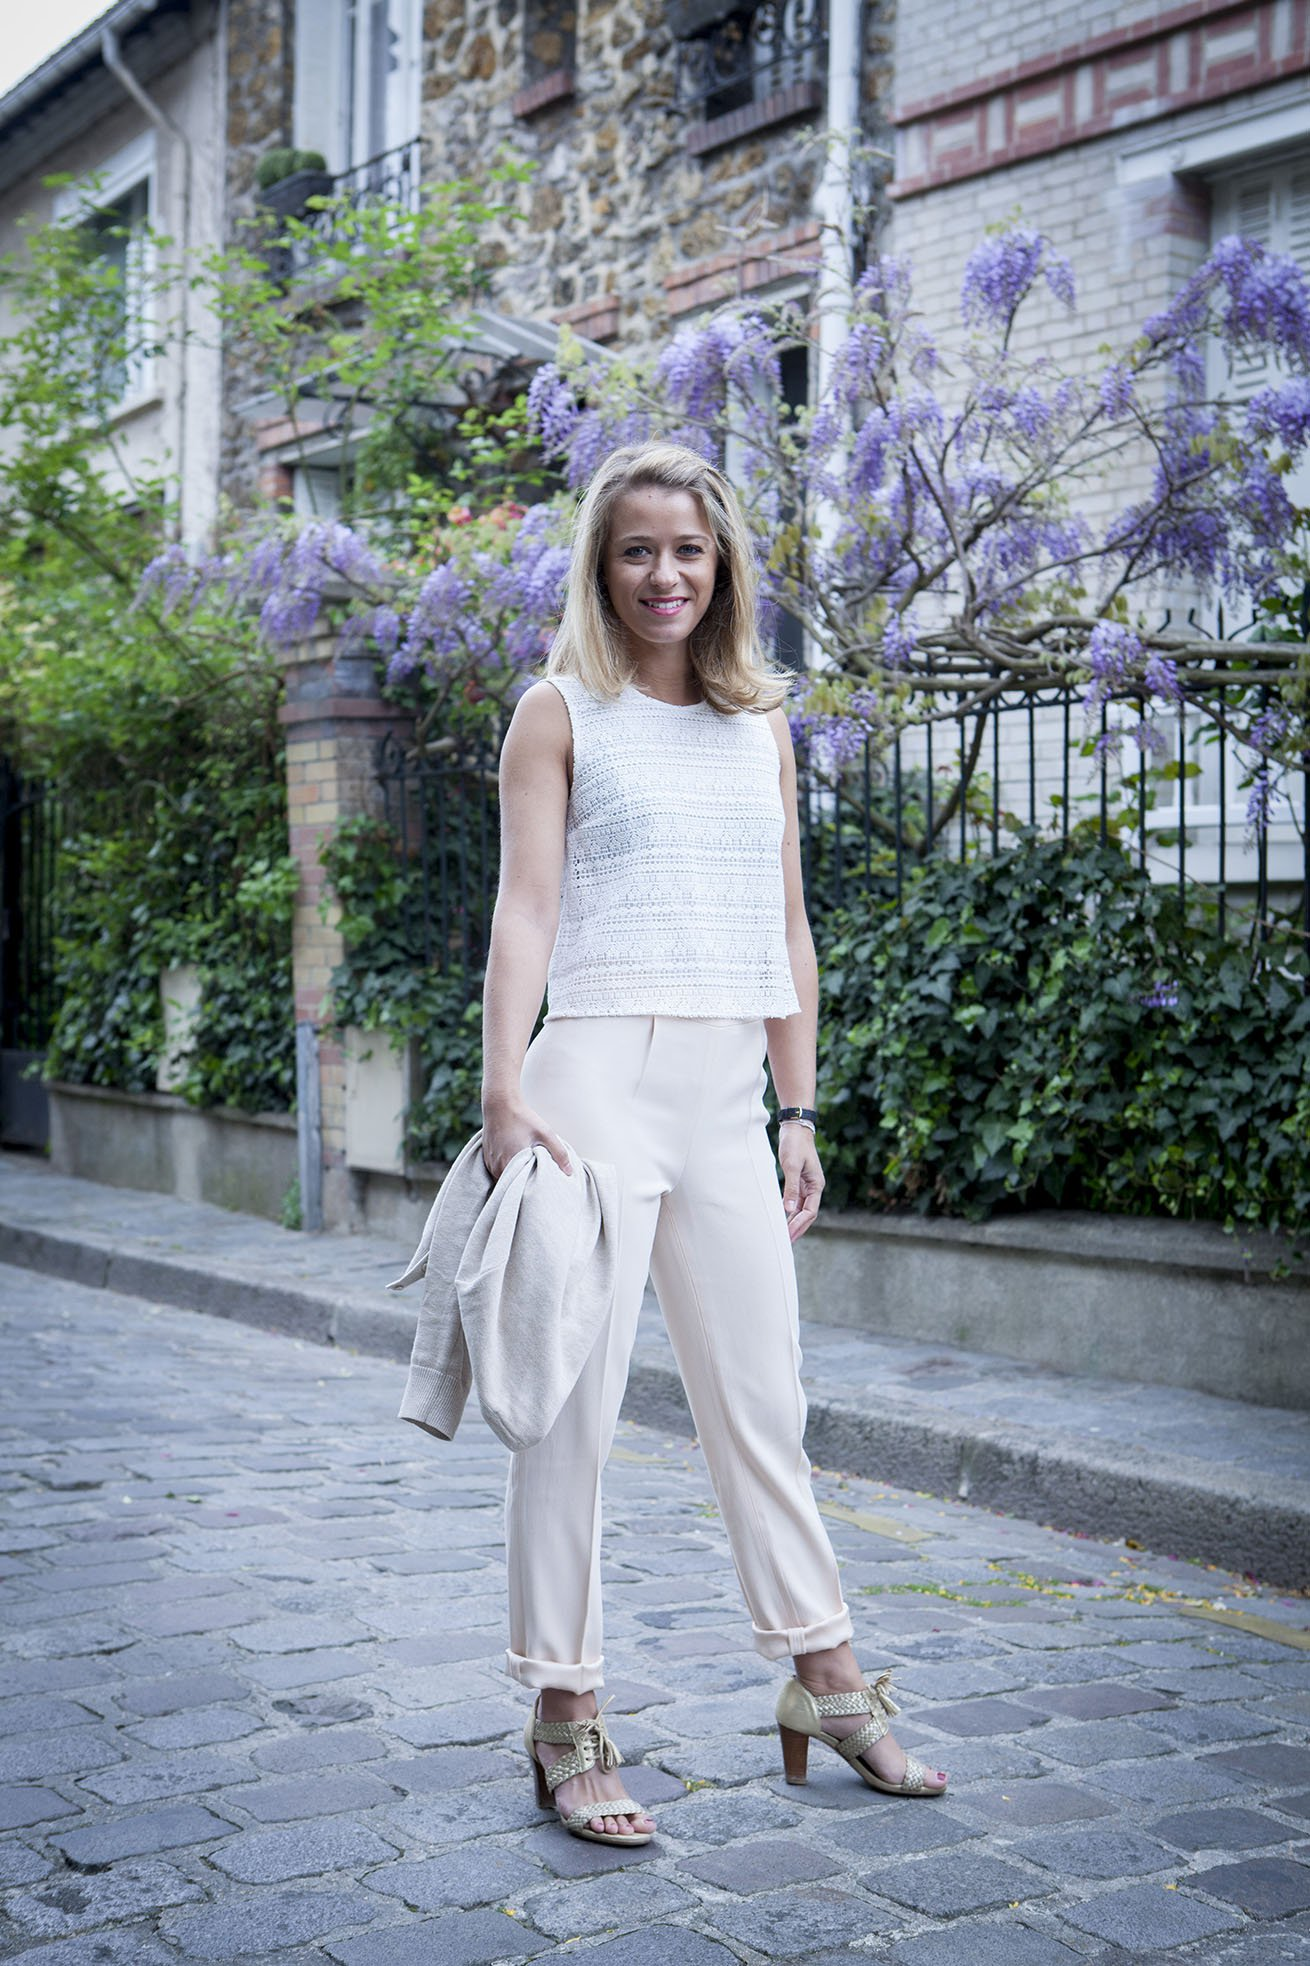 Pauline Lahary, CV, French entrepreneure